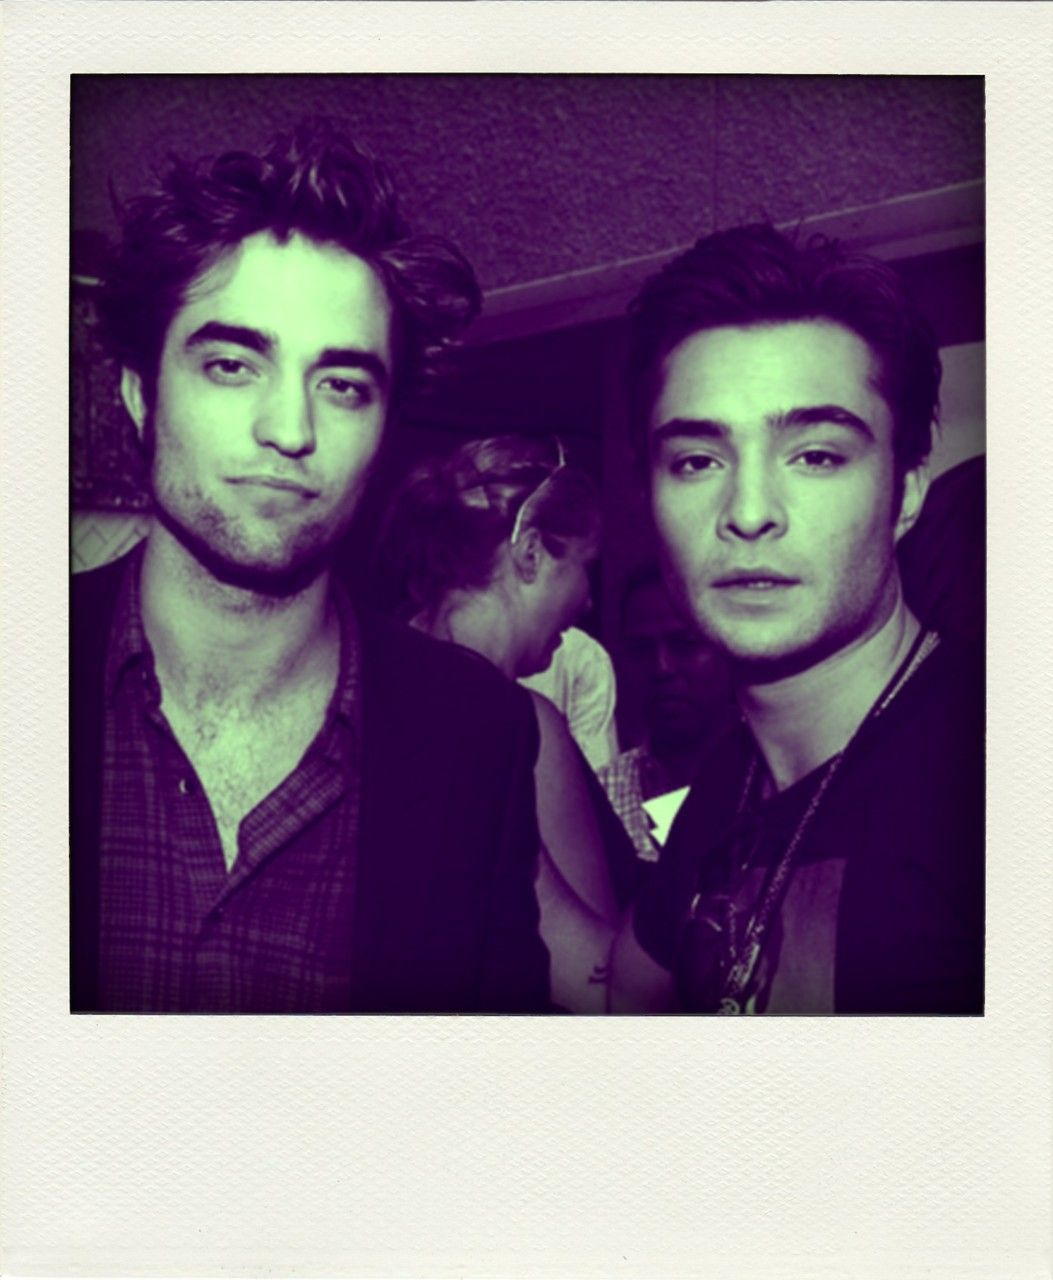 Robert Pattinson and Ed Westwick